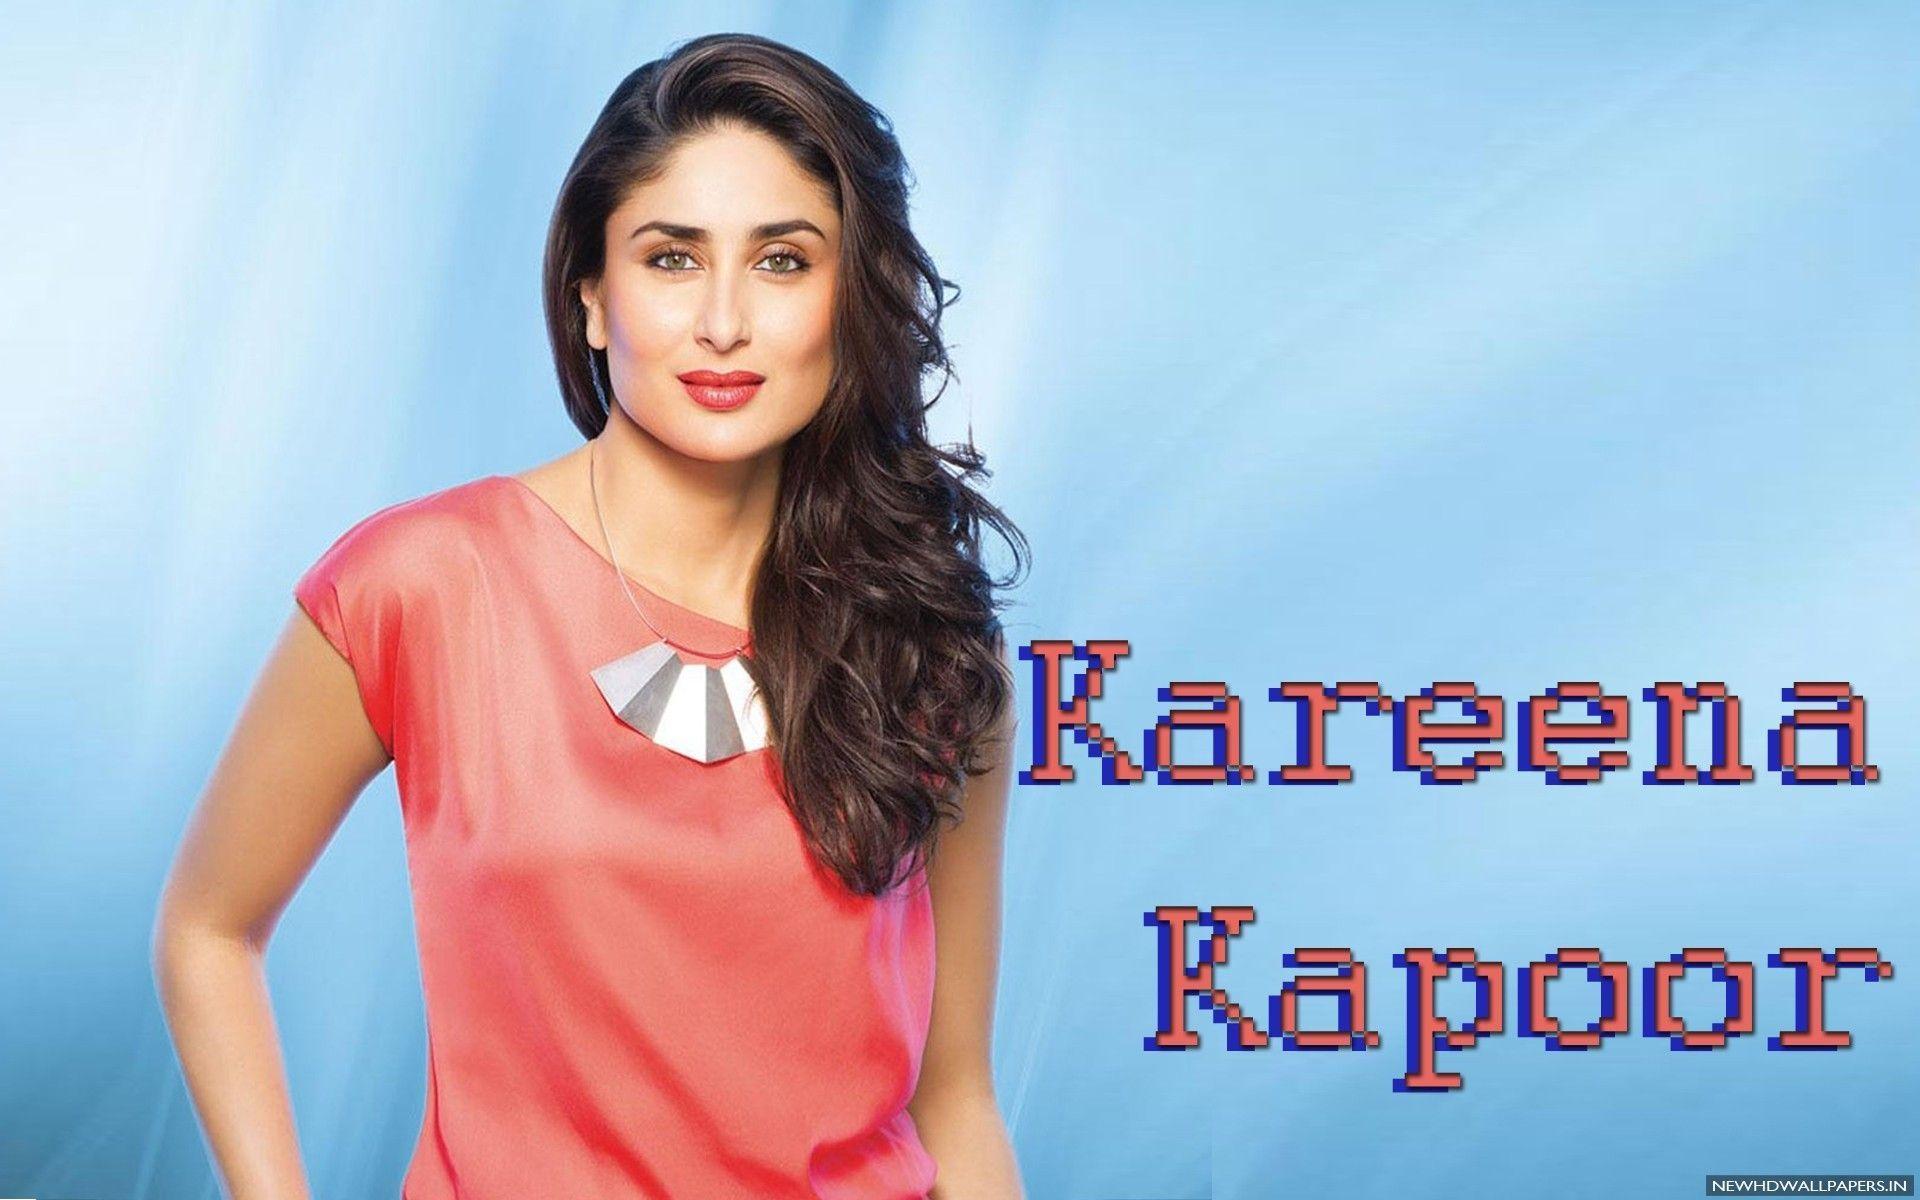 Kareena Kapoor HD Wallpapers 2015 1920x1200